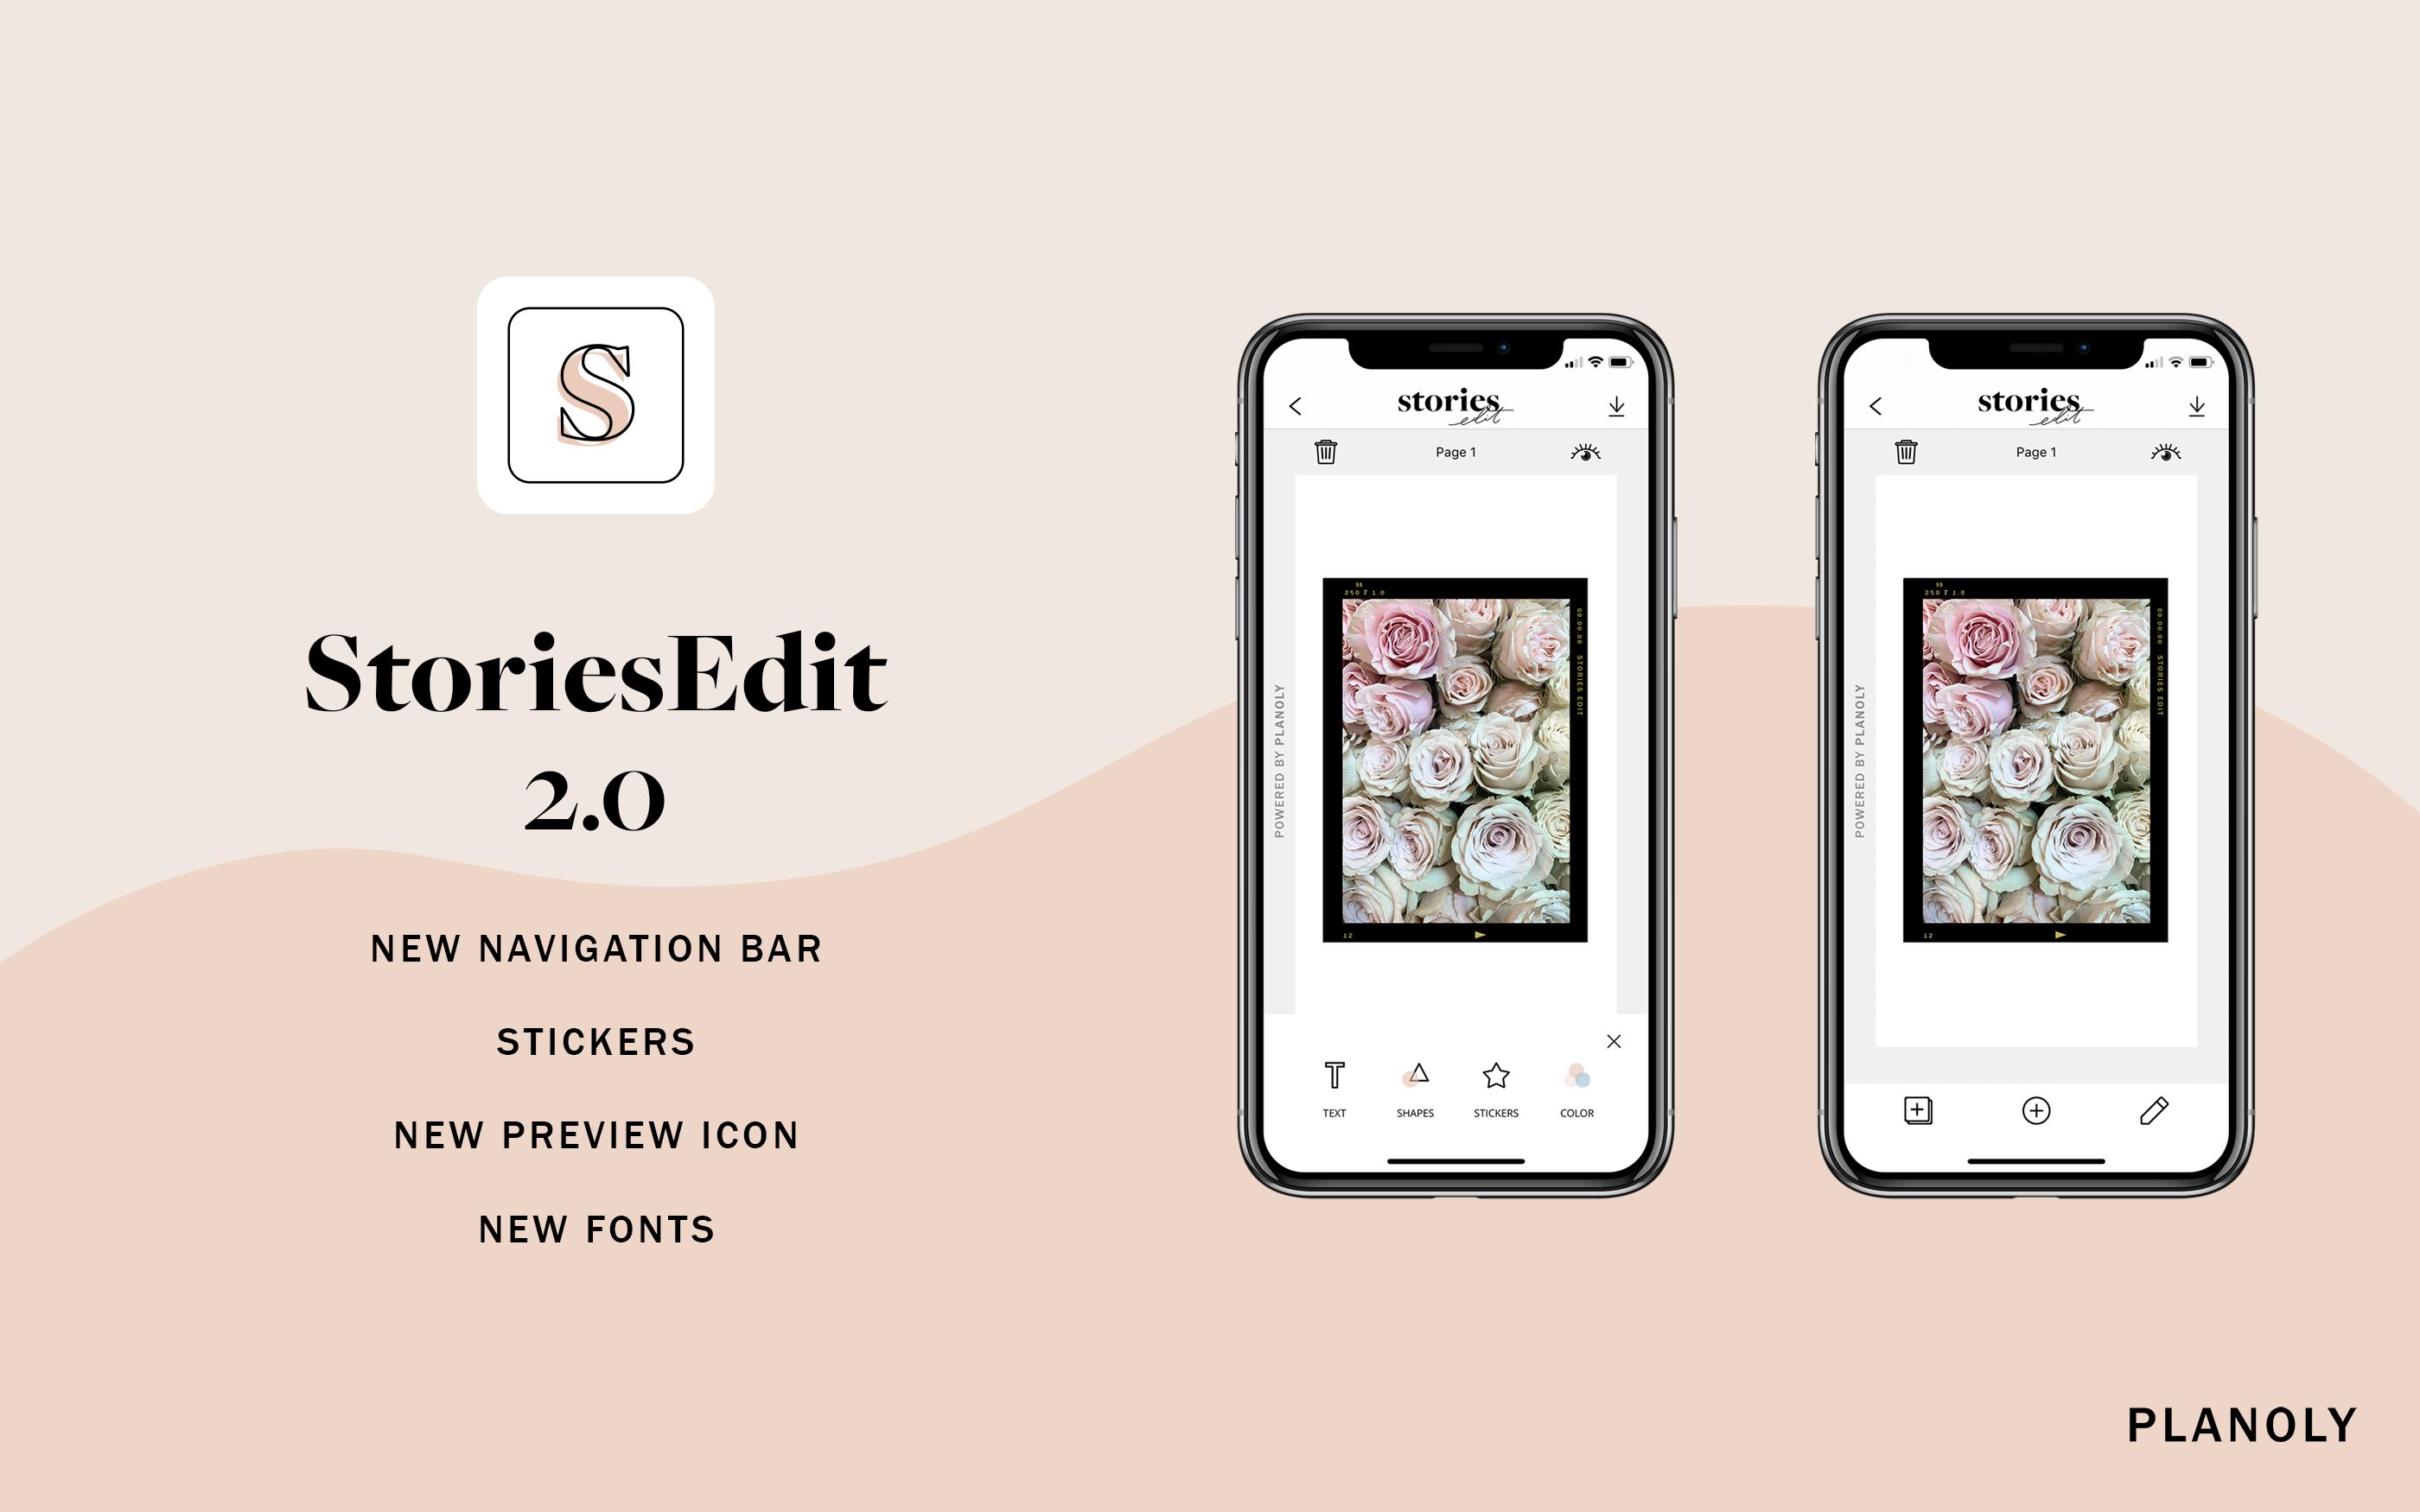 New Announcement: StoriesEdit 2.0